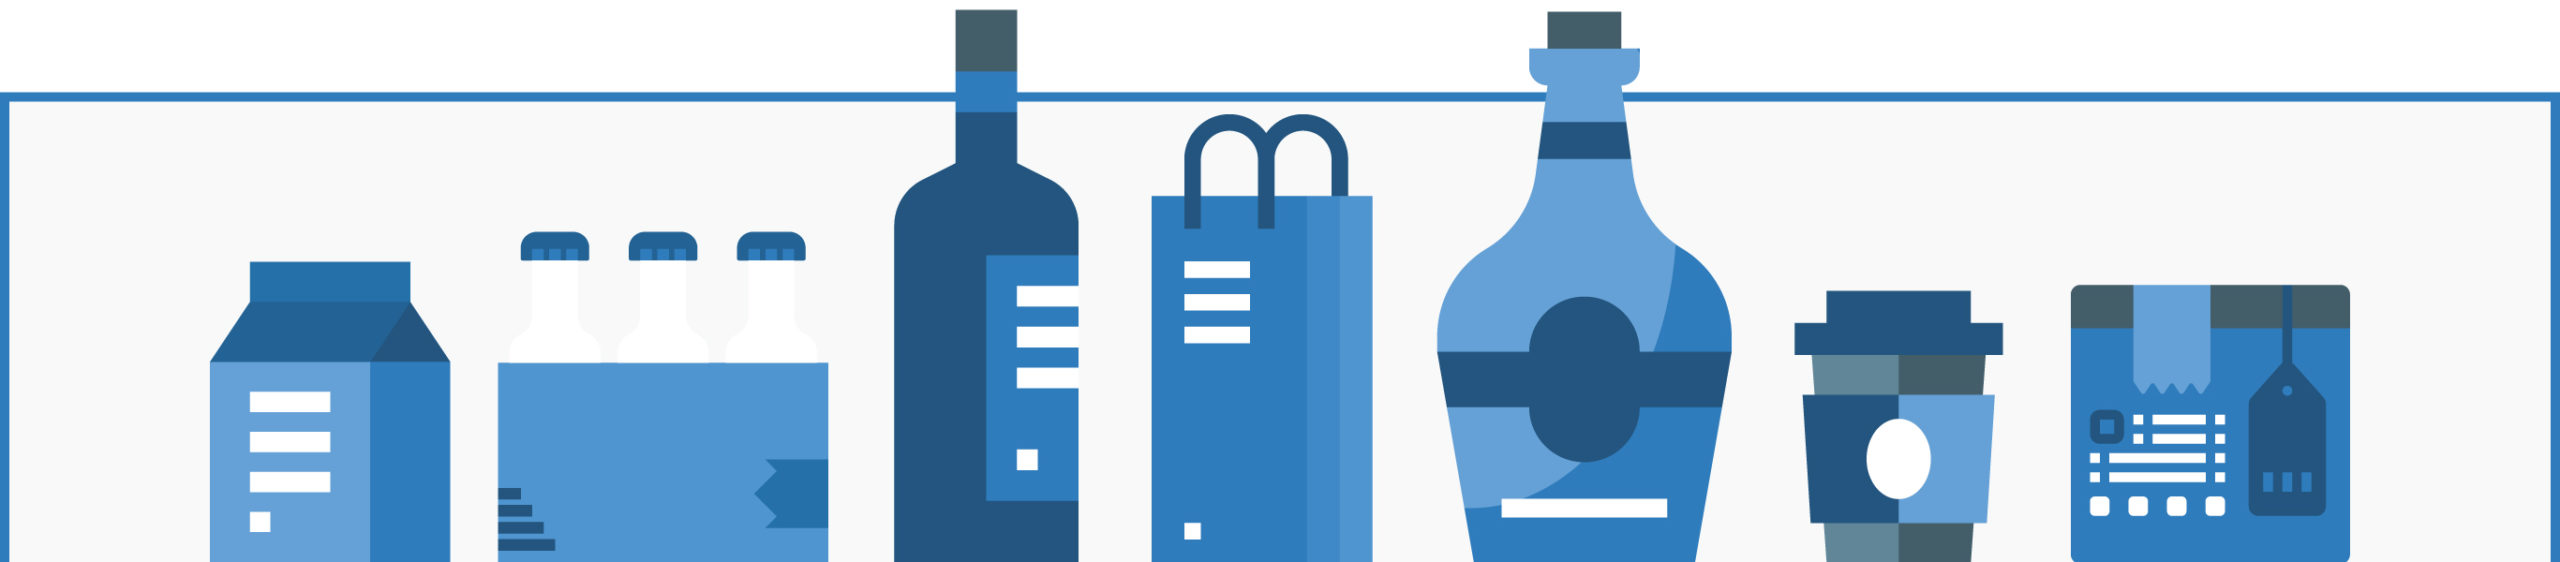 packaging design infographic banner desktop